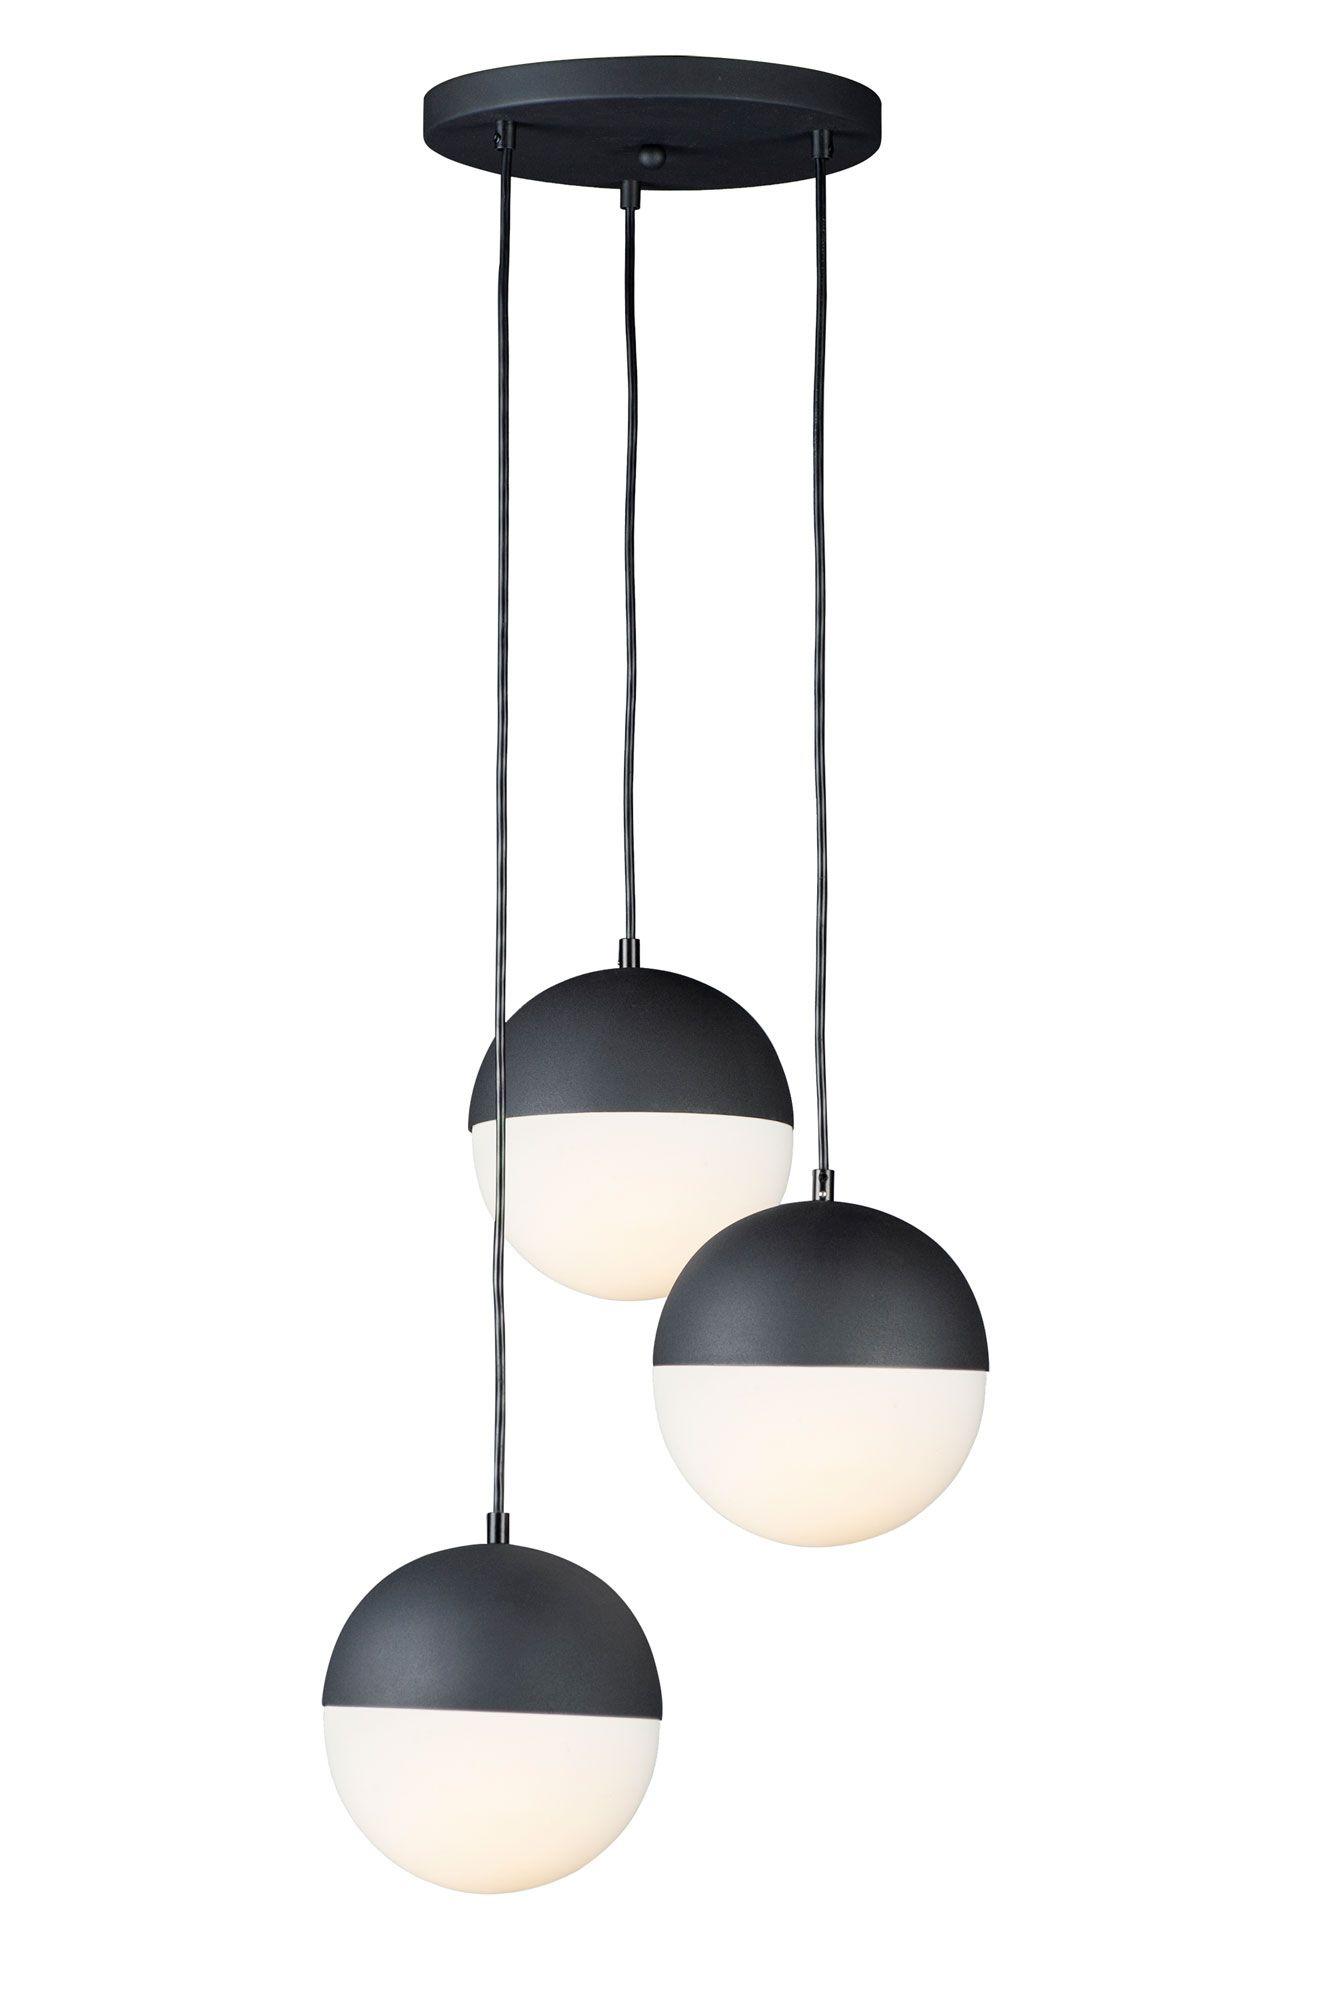 Pin On Modern Interior Design Lighting Ideas